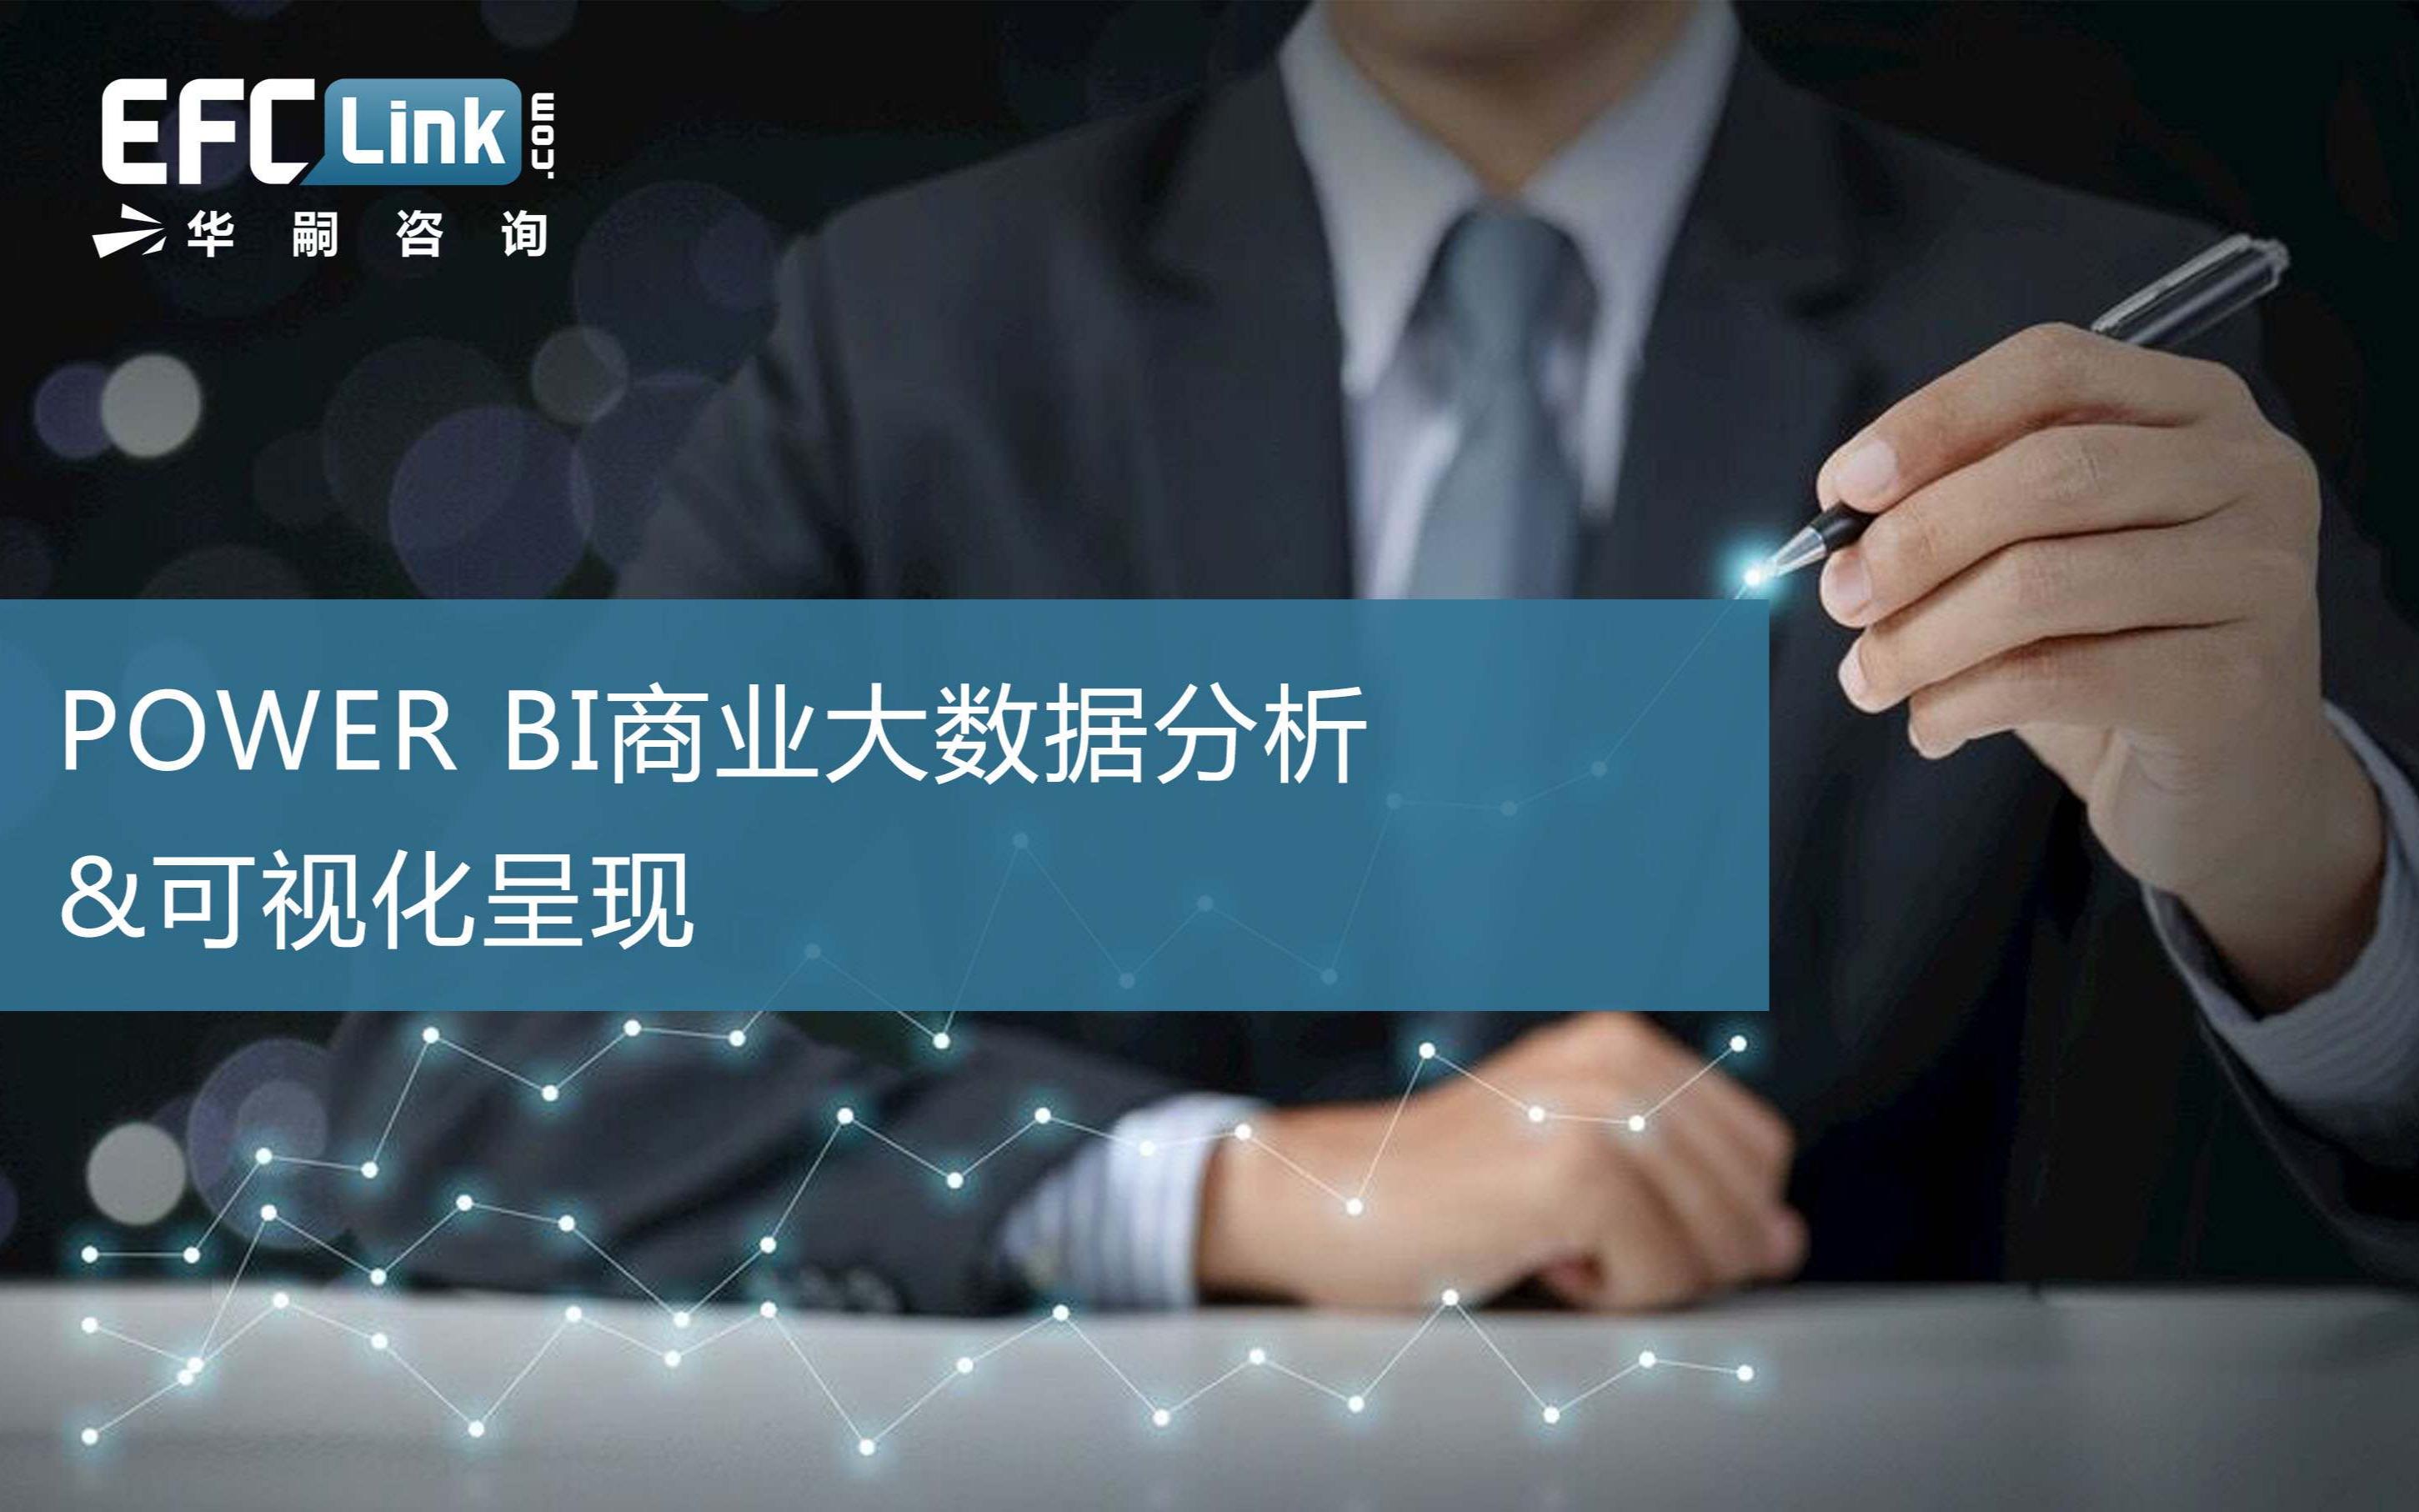 2020POWER BI商業大數據分析&可視化呈現(成都-7月24日)